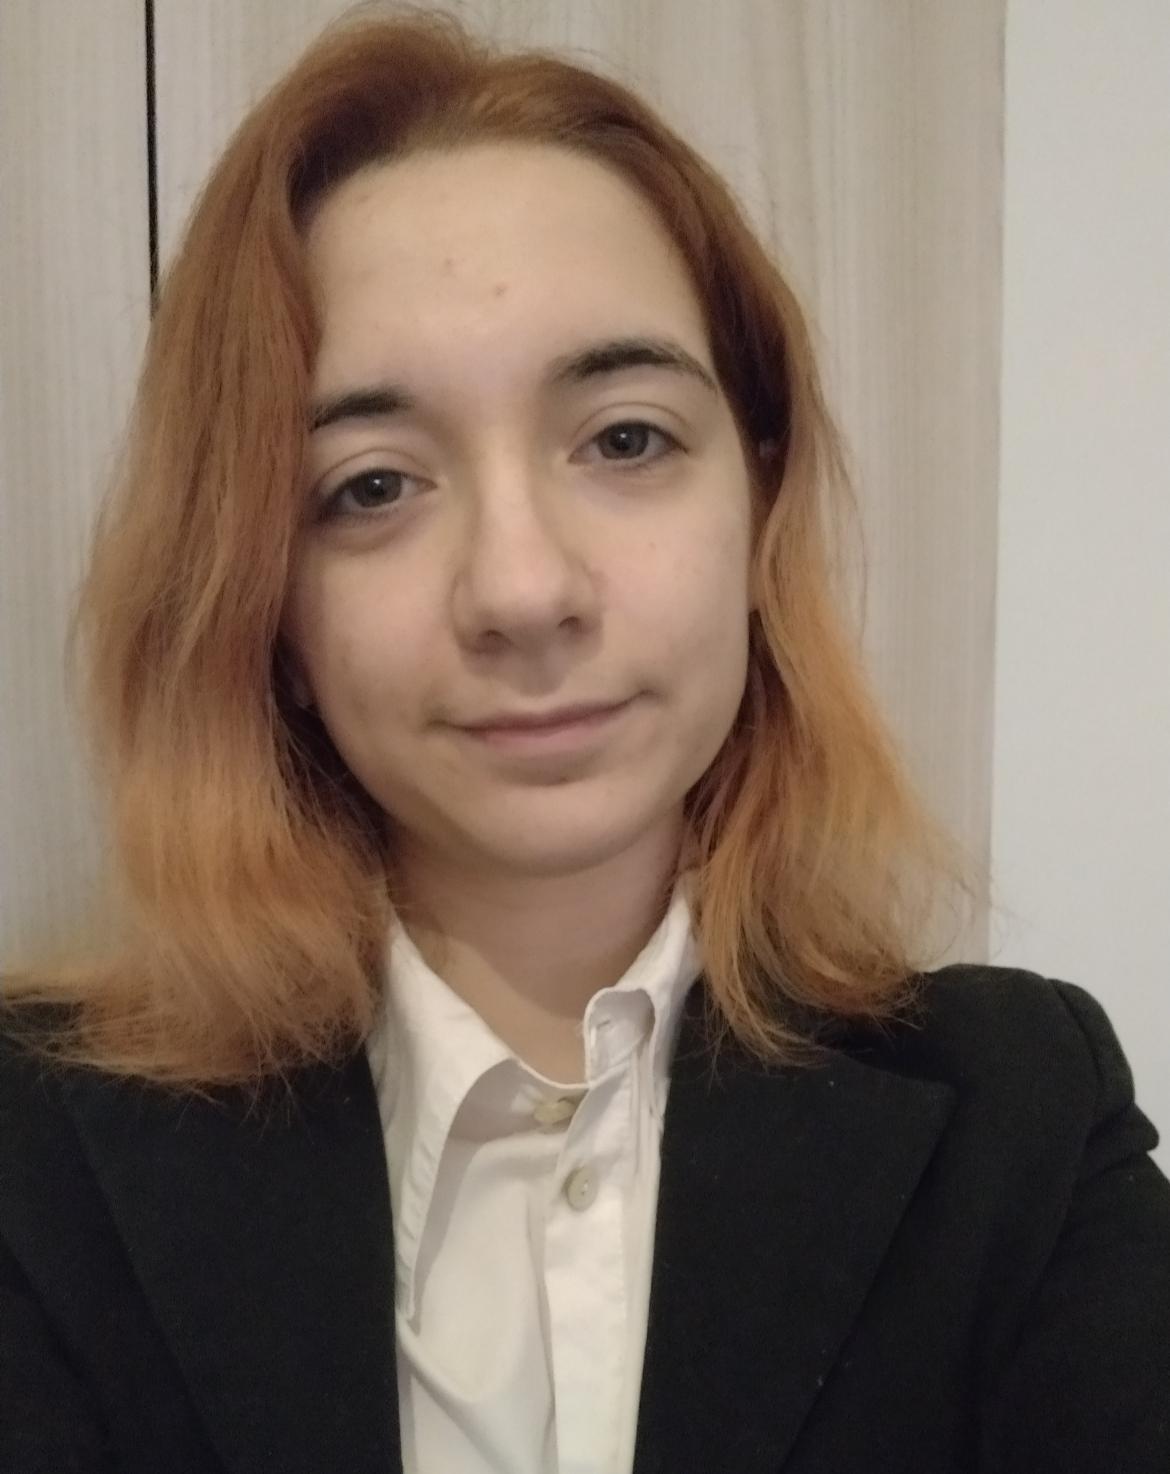 Giulia Zangirolami